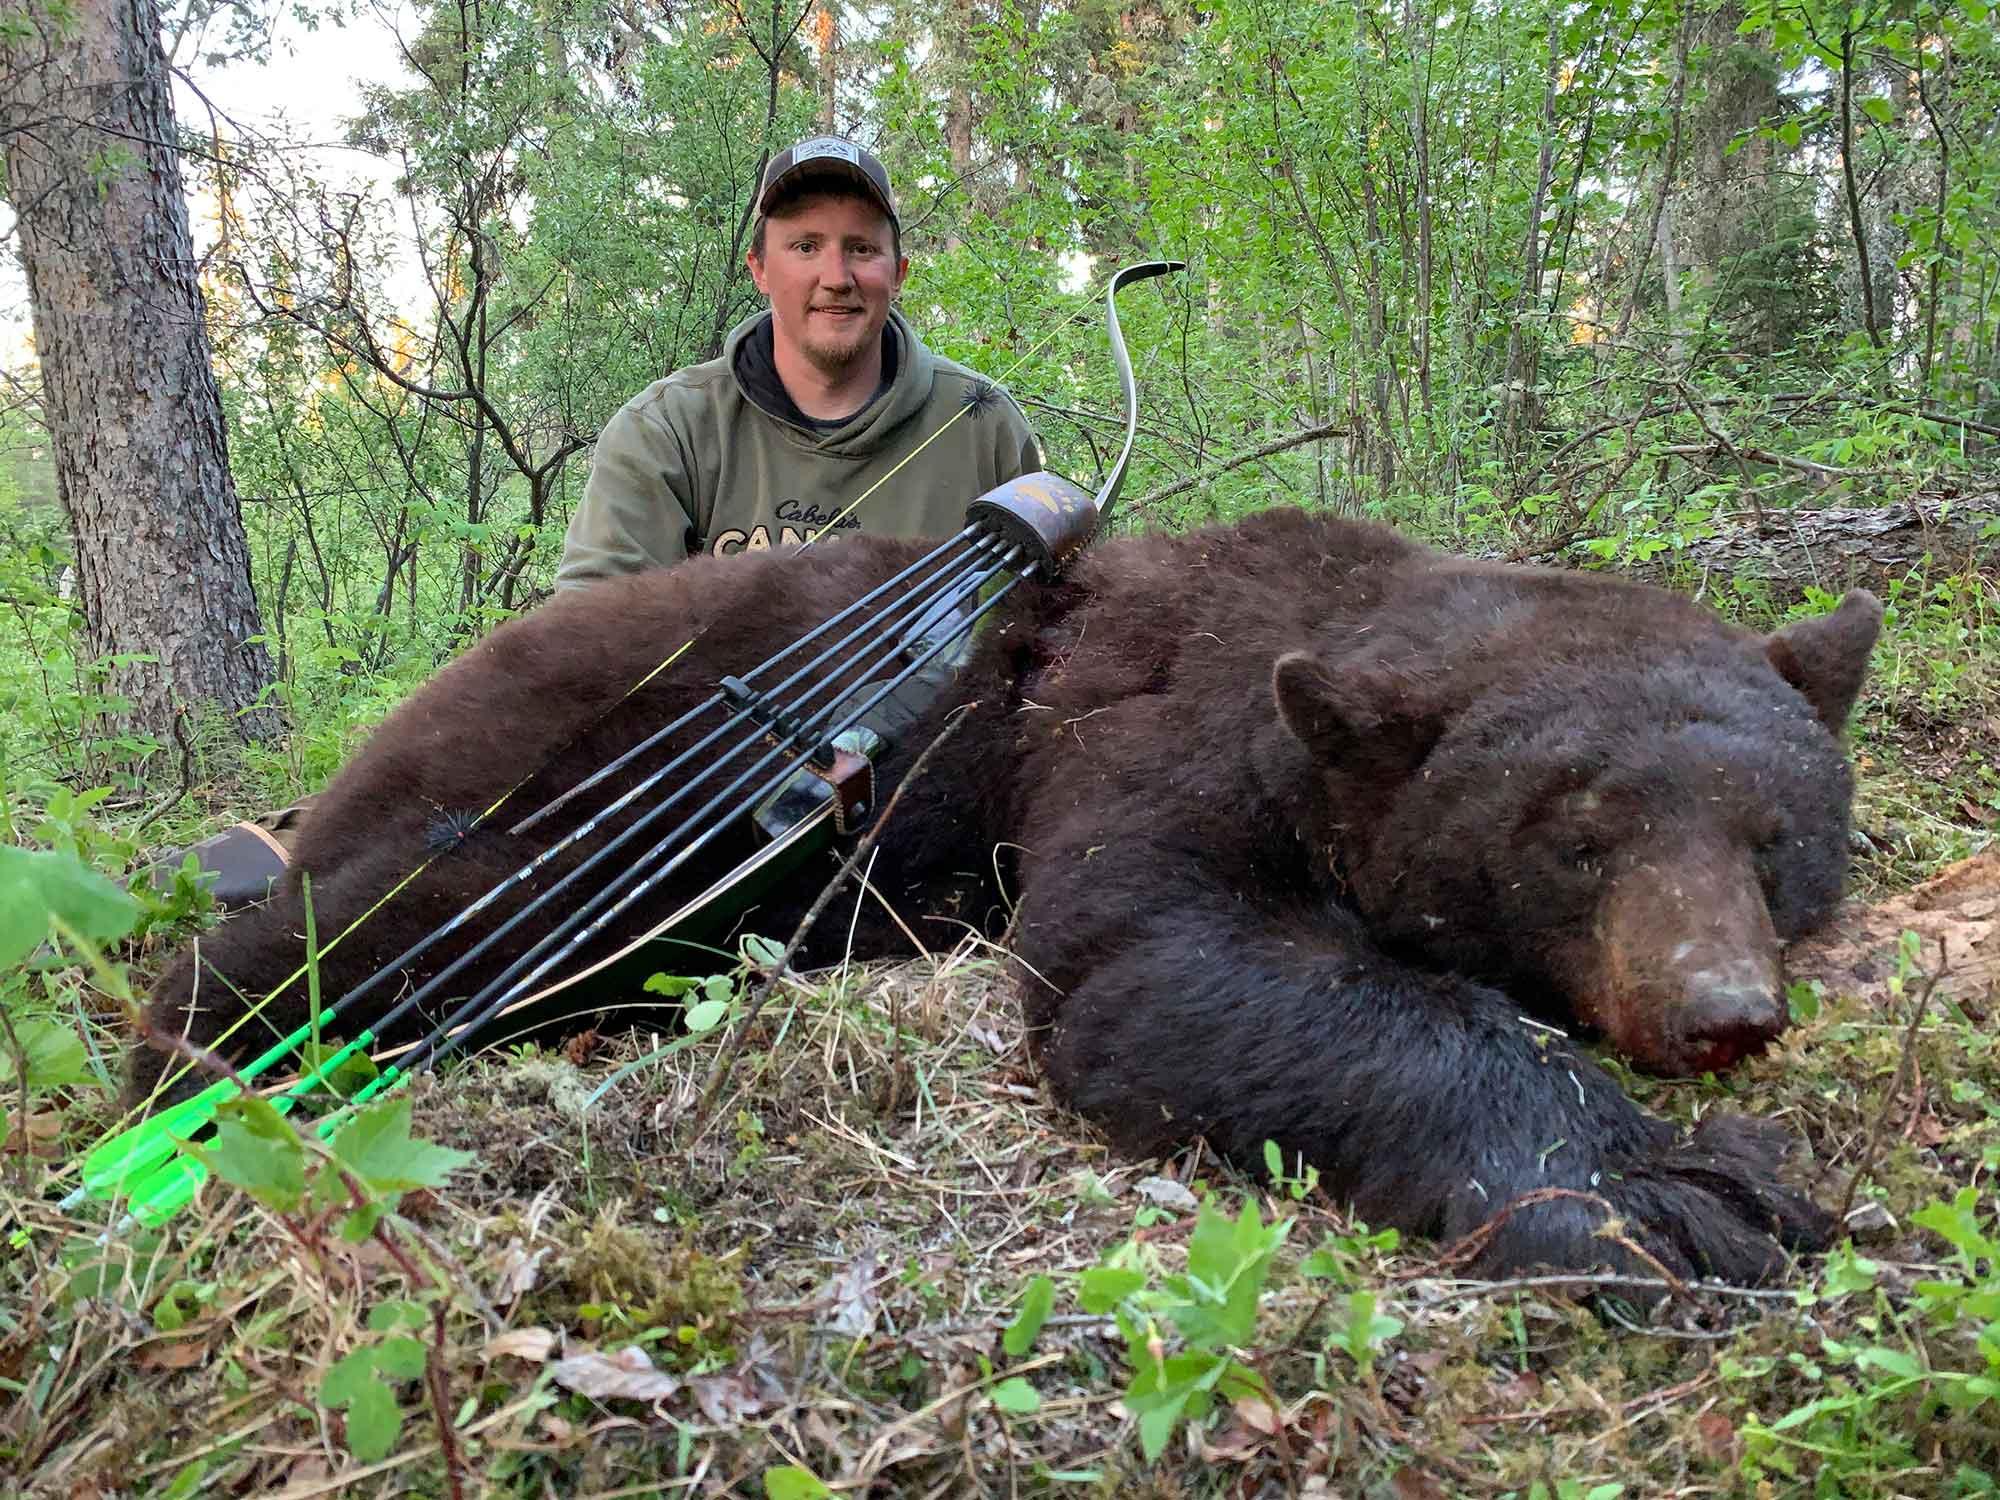 Hunter beside dead bear and bow